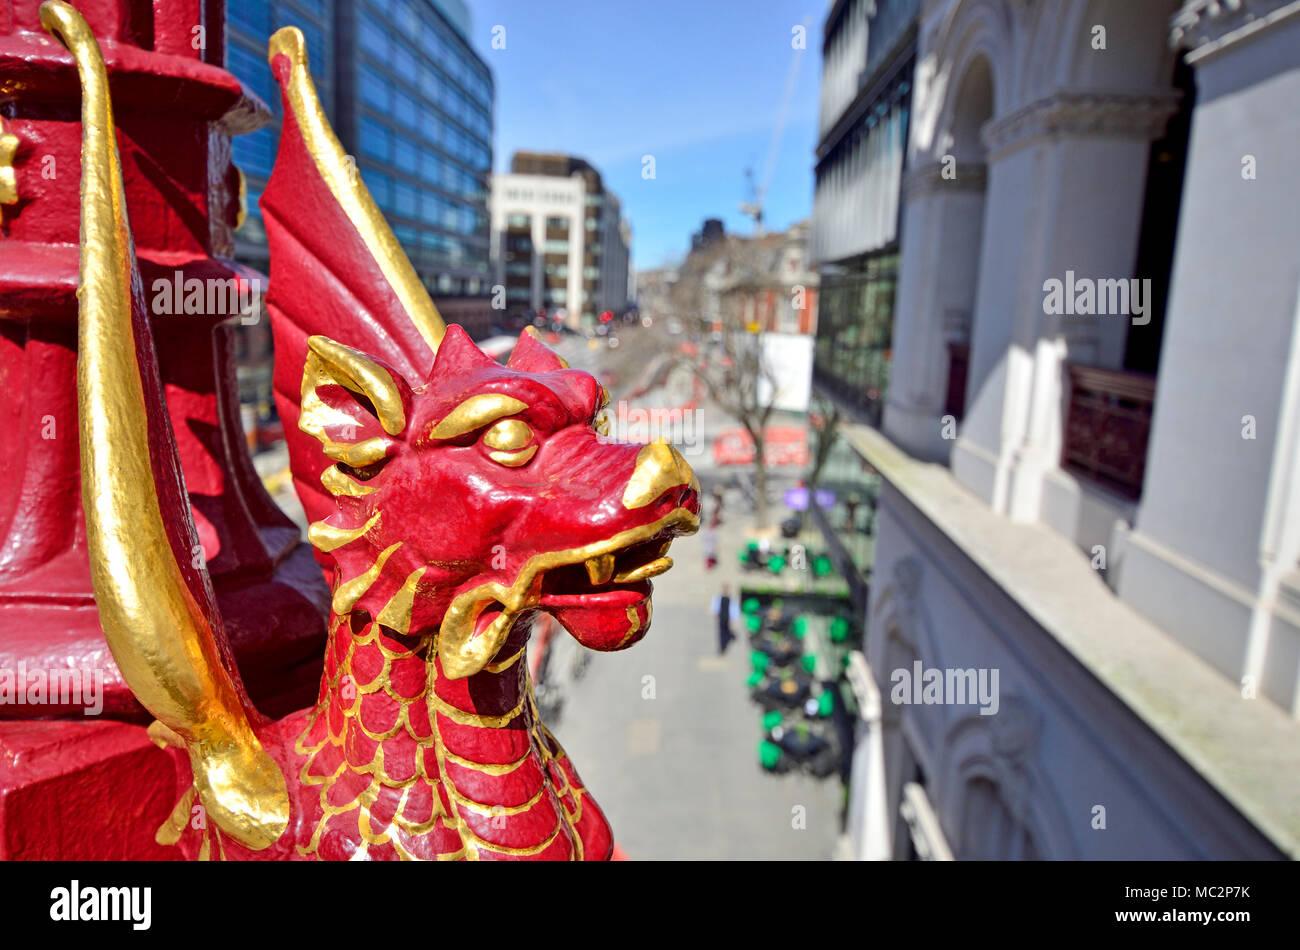 London, England, UK. Head of a dragon on Holborn Viaduct. - Stock Image